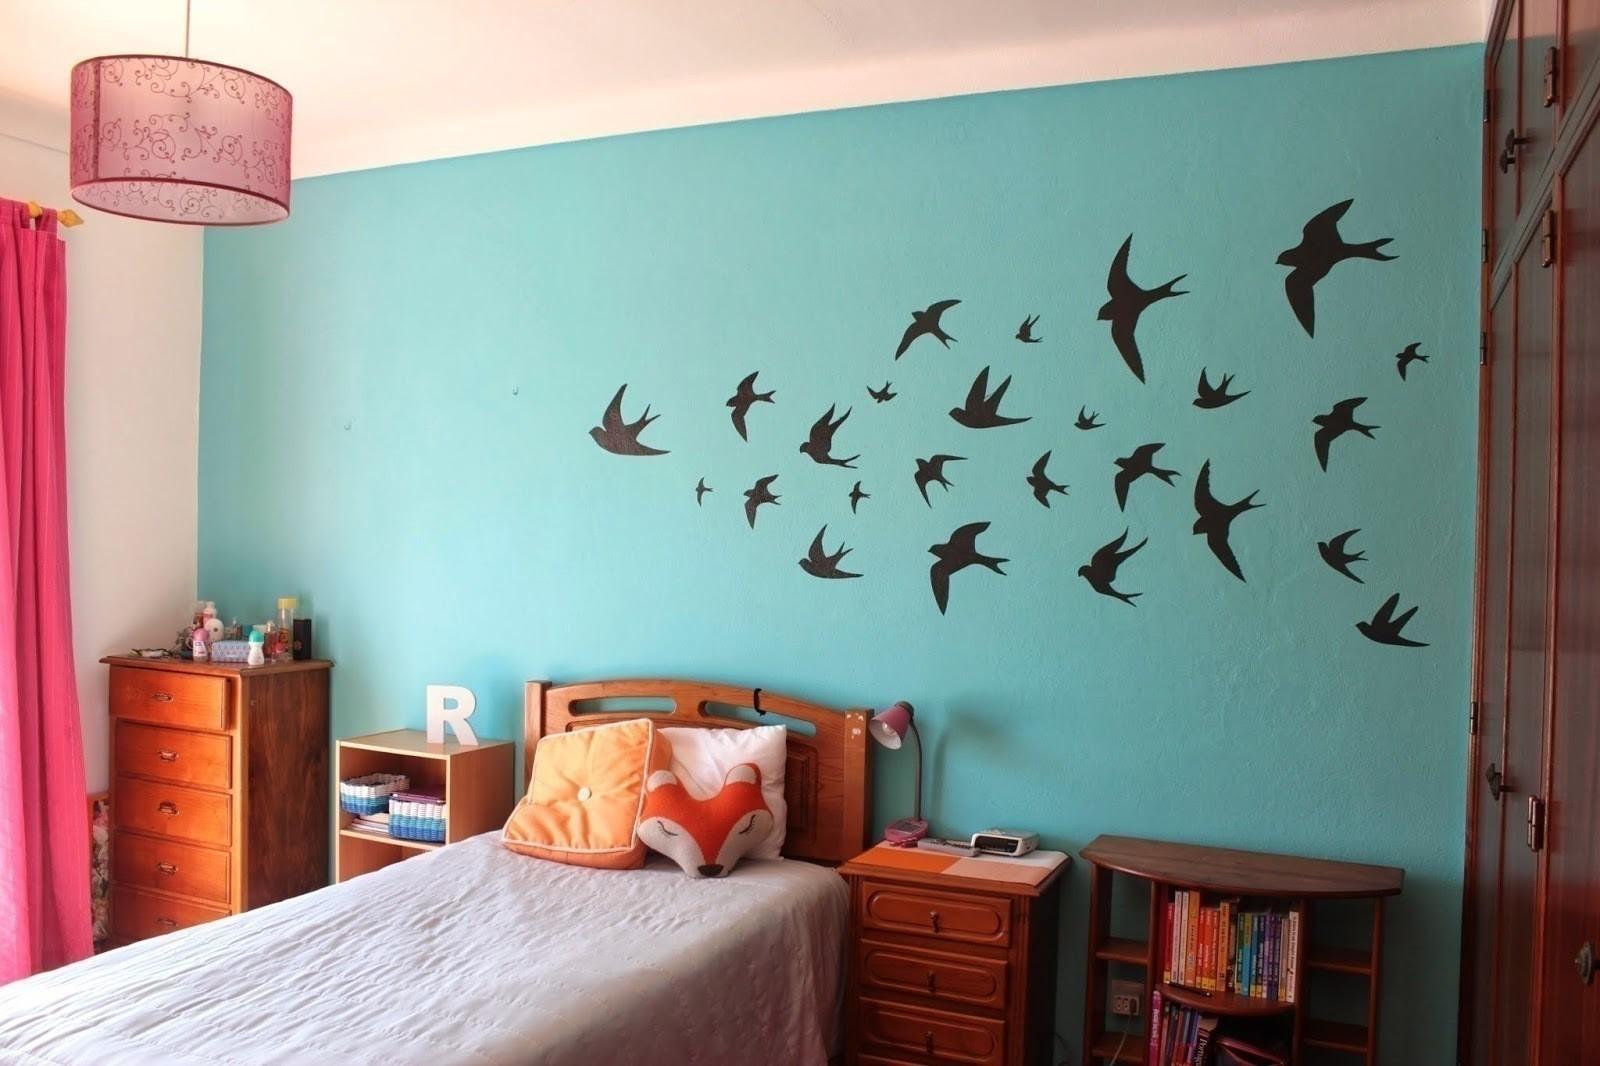 Wallpaper Teenage Girl Bedroom Swallows Wall Decor 183 How To Make Wallpaper A Wall